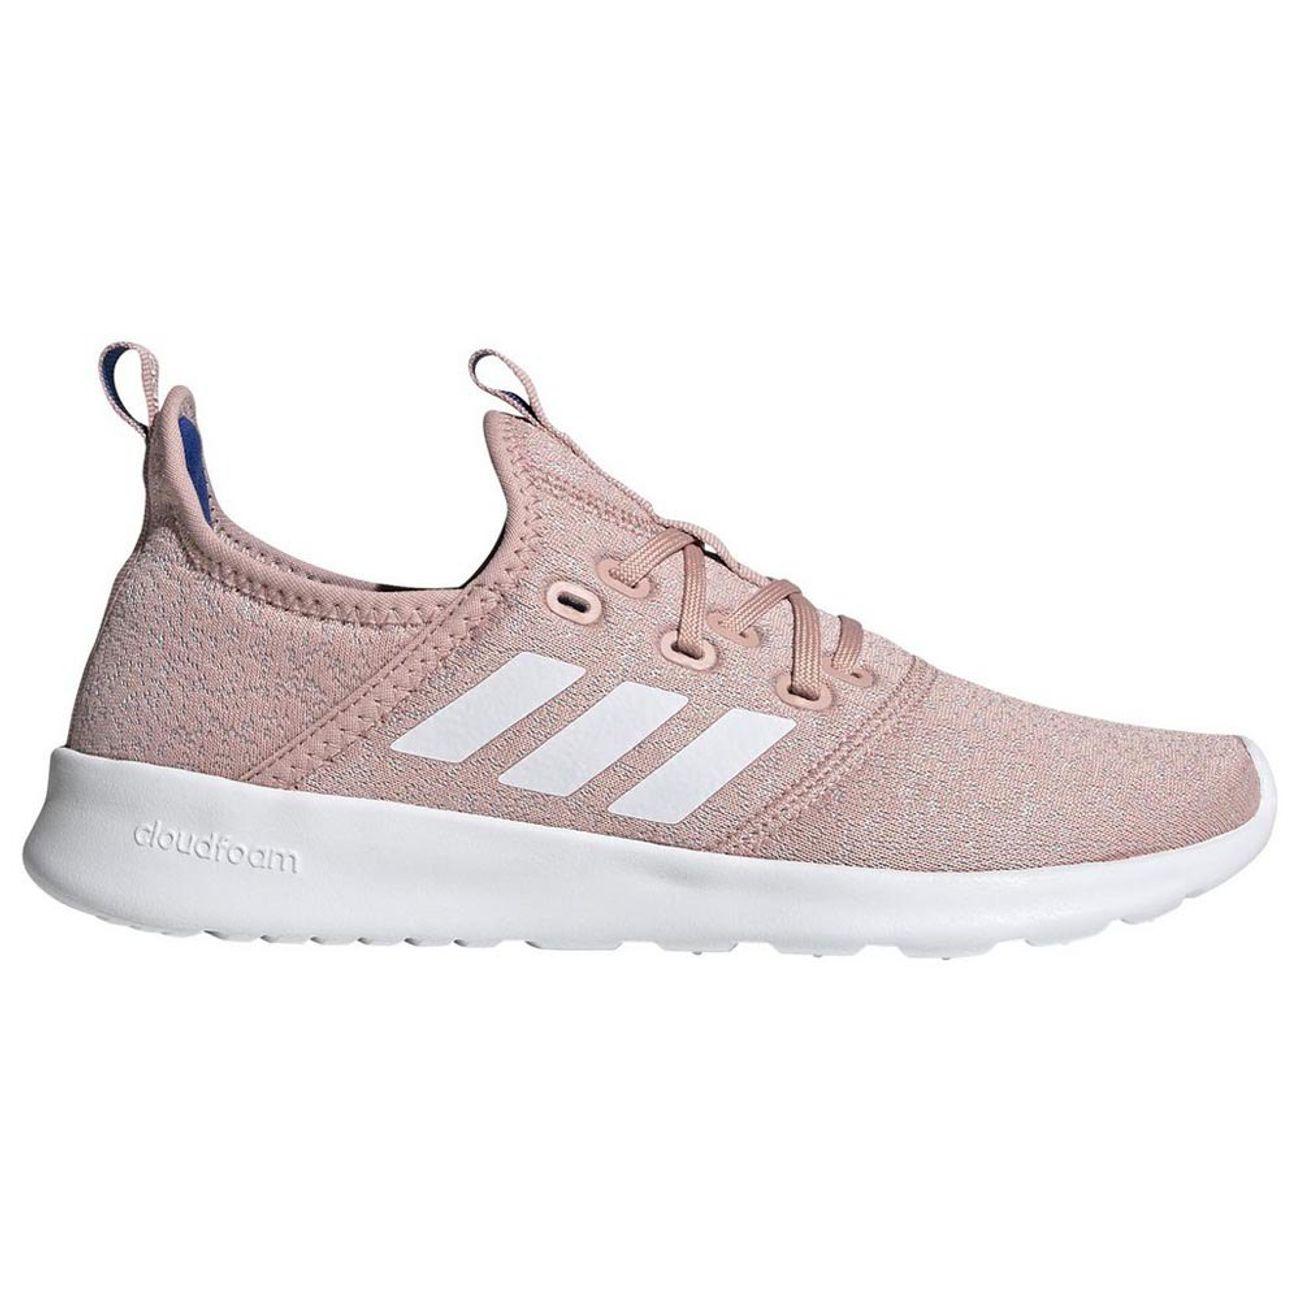 Course à pied femme ADIDAS Chaussures femme adidas Cloudfoam Pure